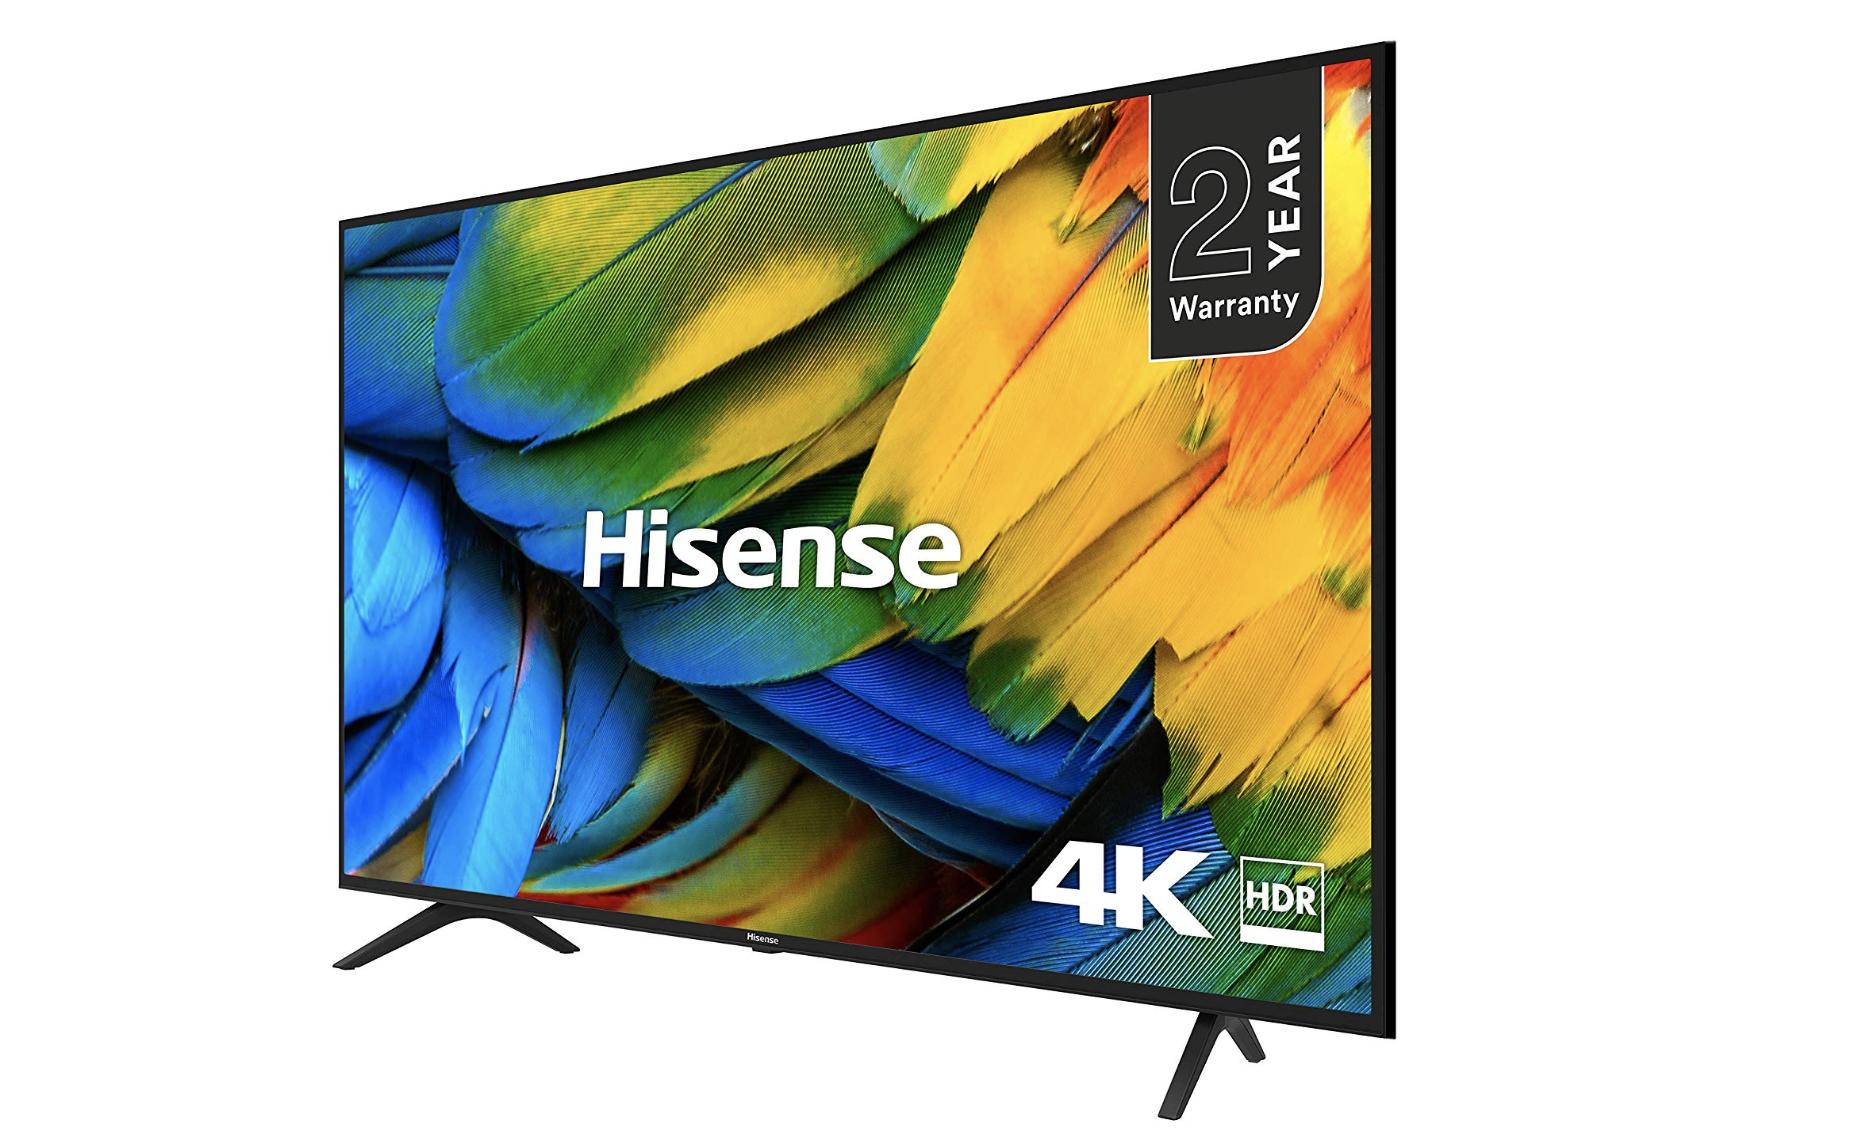 Best Black Friday TV deals: save up to 37% on Hisense TVs